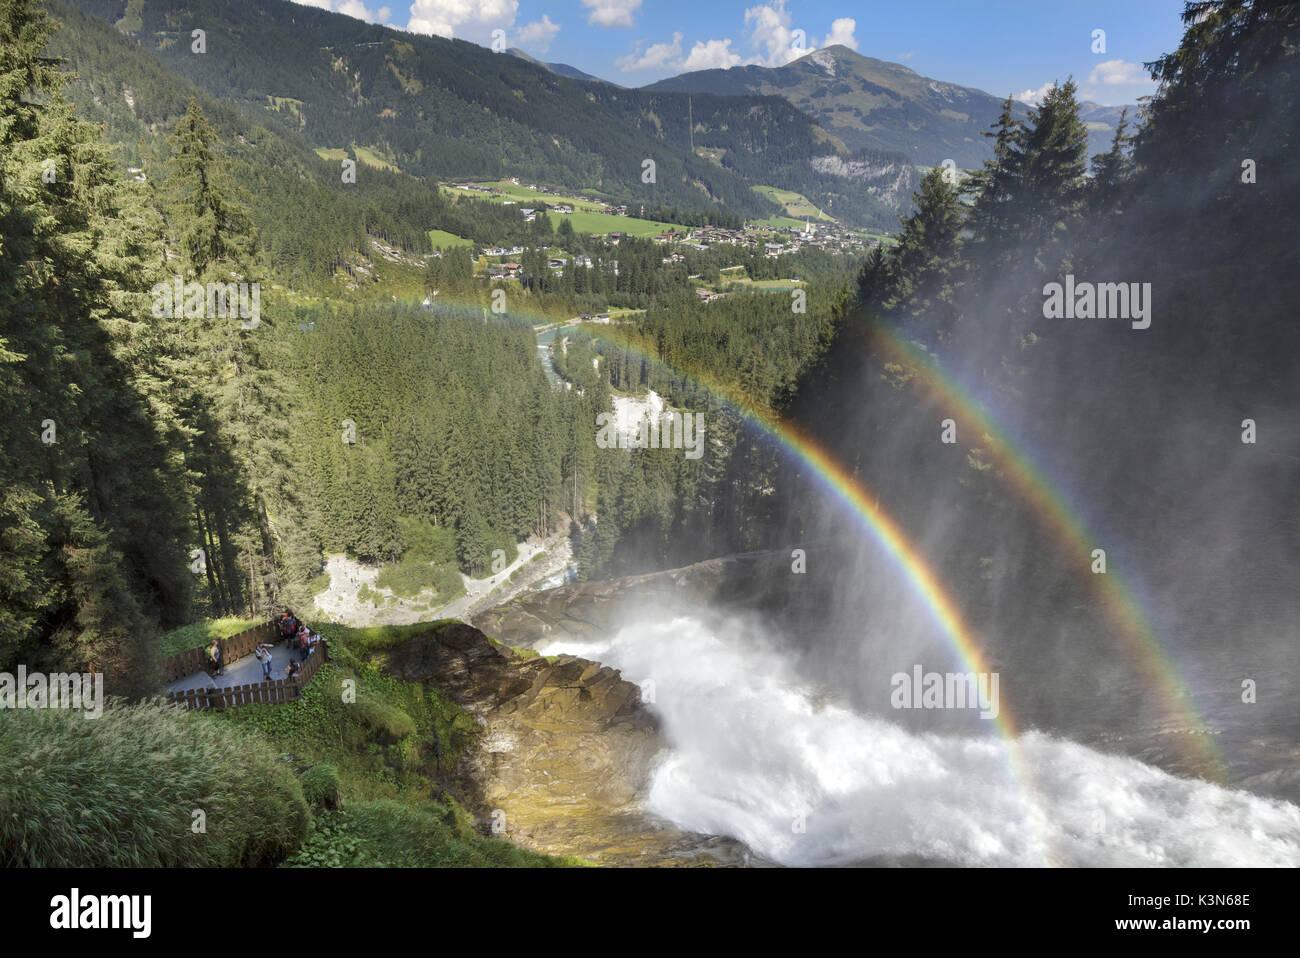 europe, Austria, Salzburg Land, Krimml, Hohe Tauern National Park, rainbow over the Krimml Waterfalls Stock Photo